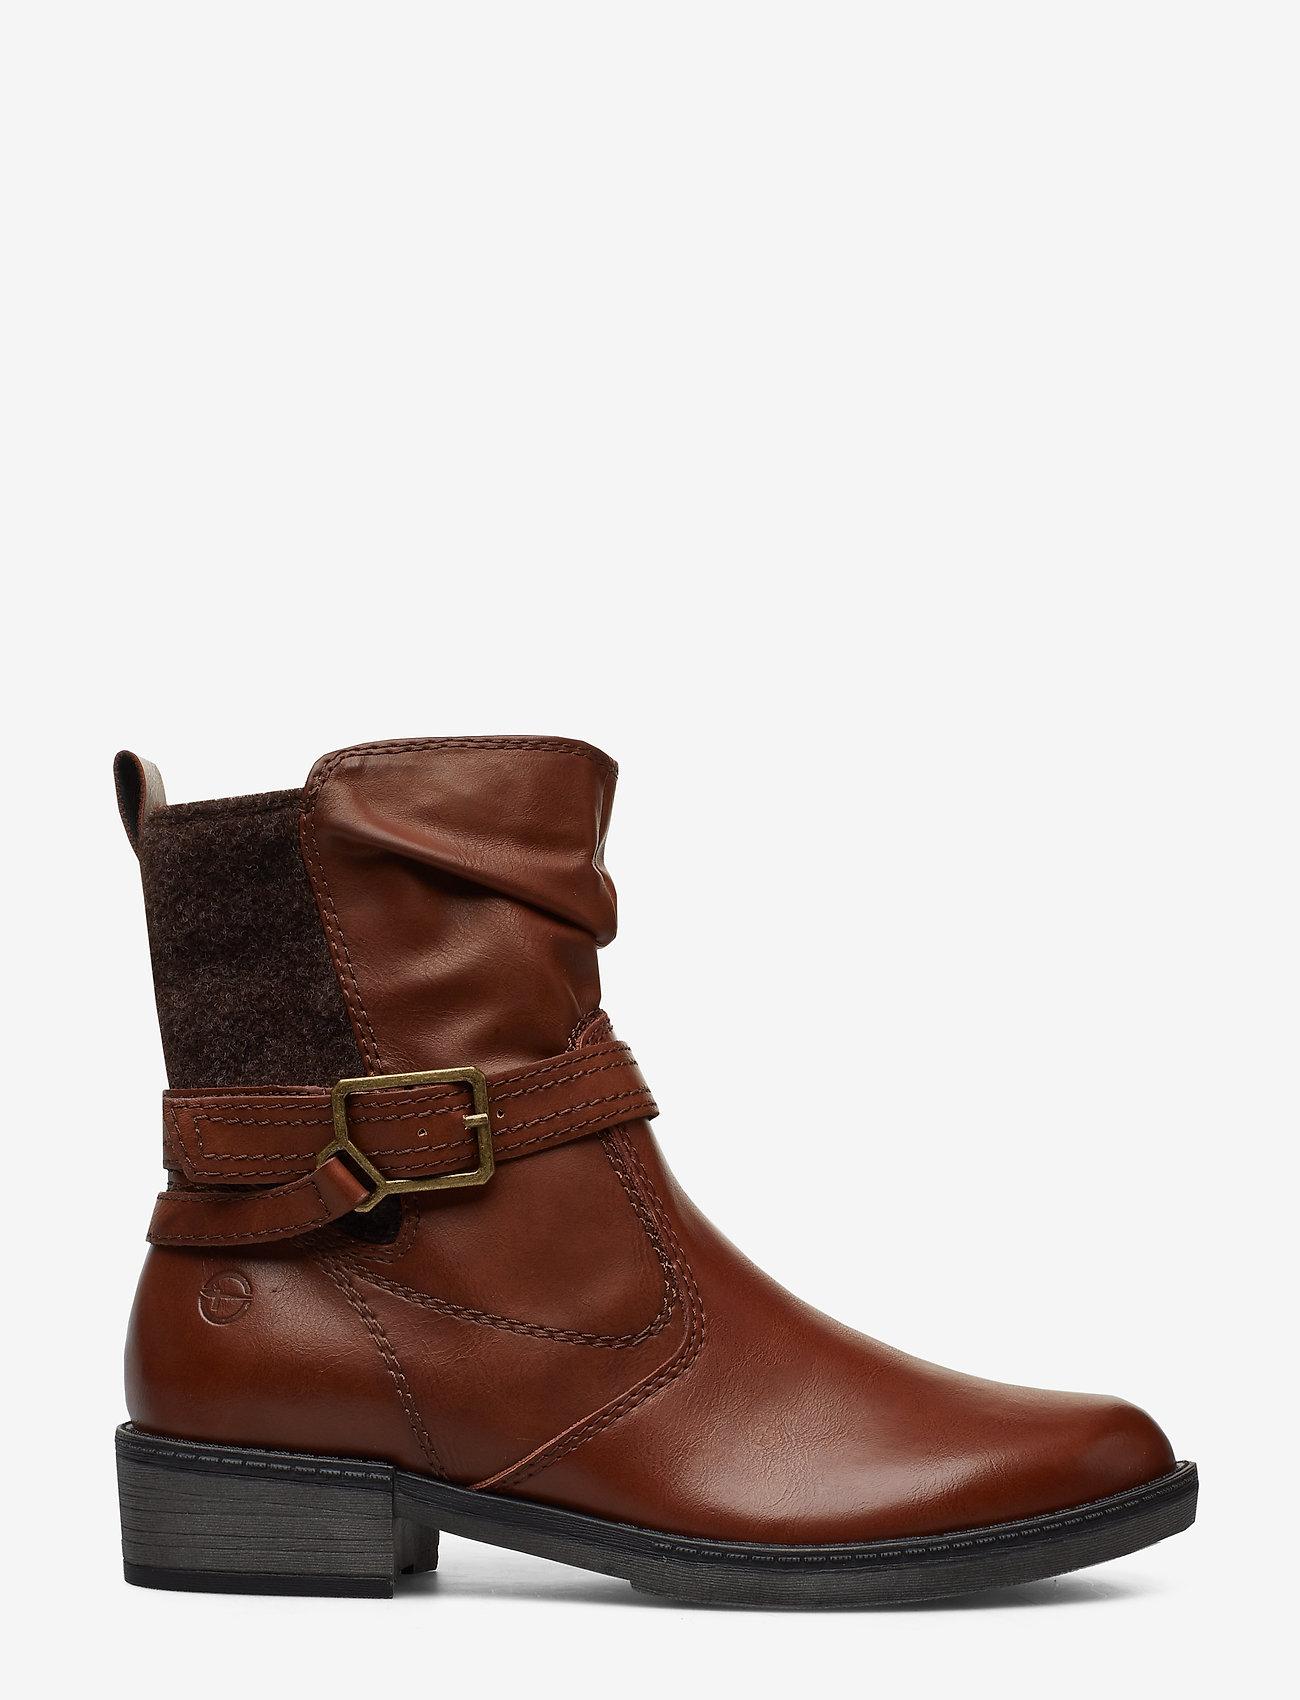 Tamaris - Boots - platta ankelboots - cognac - 1